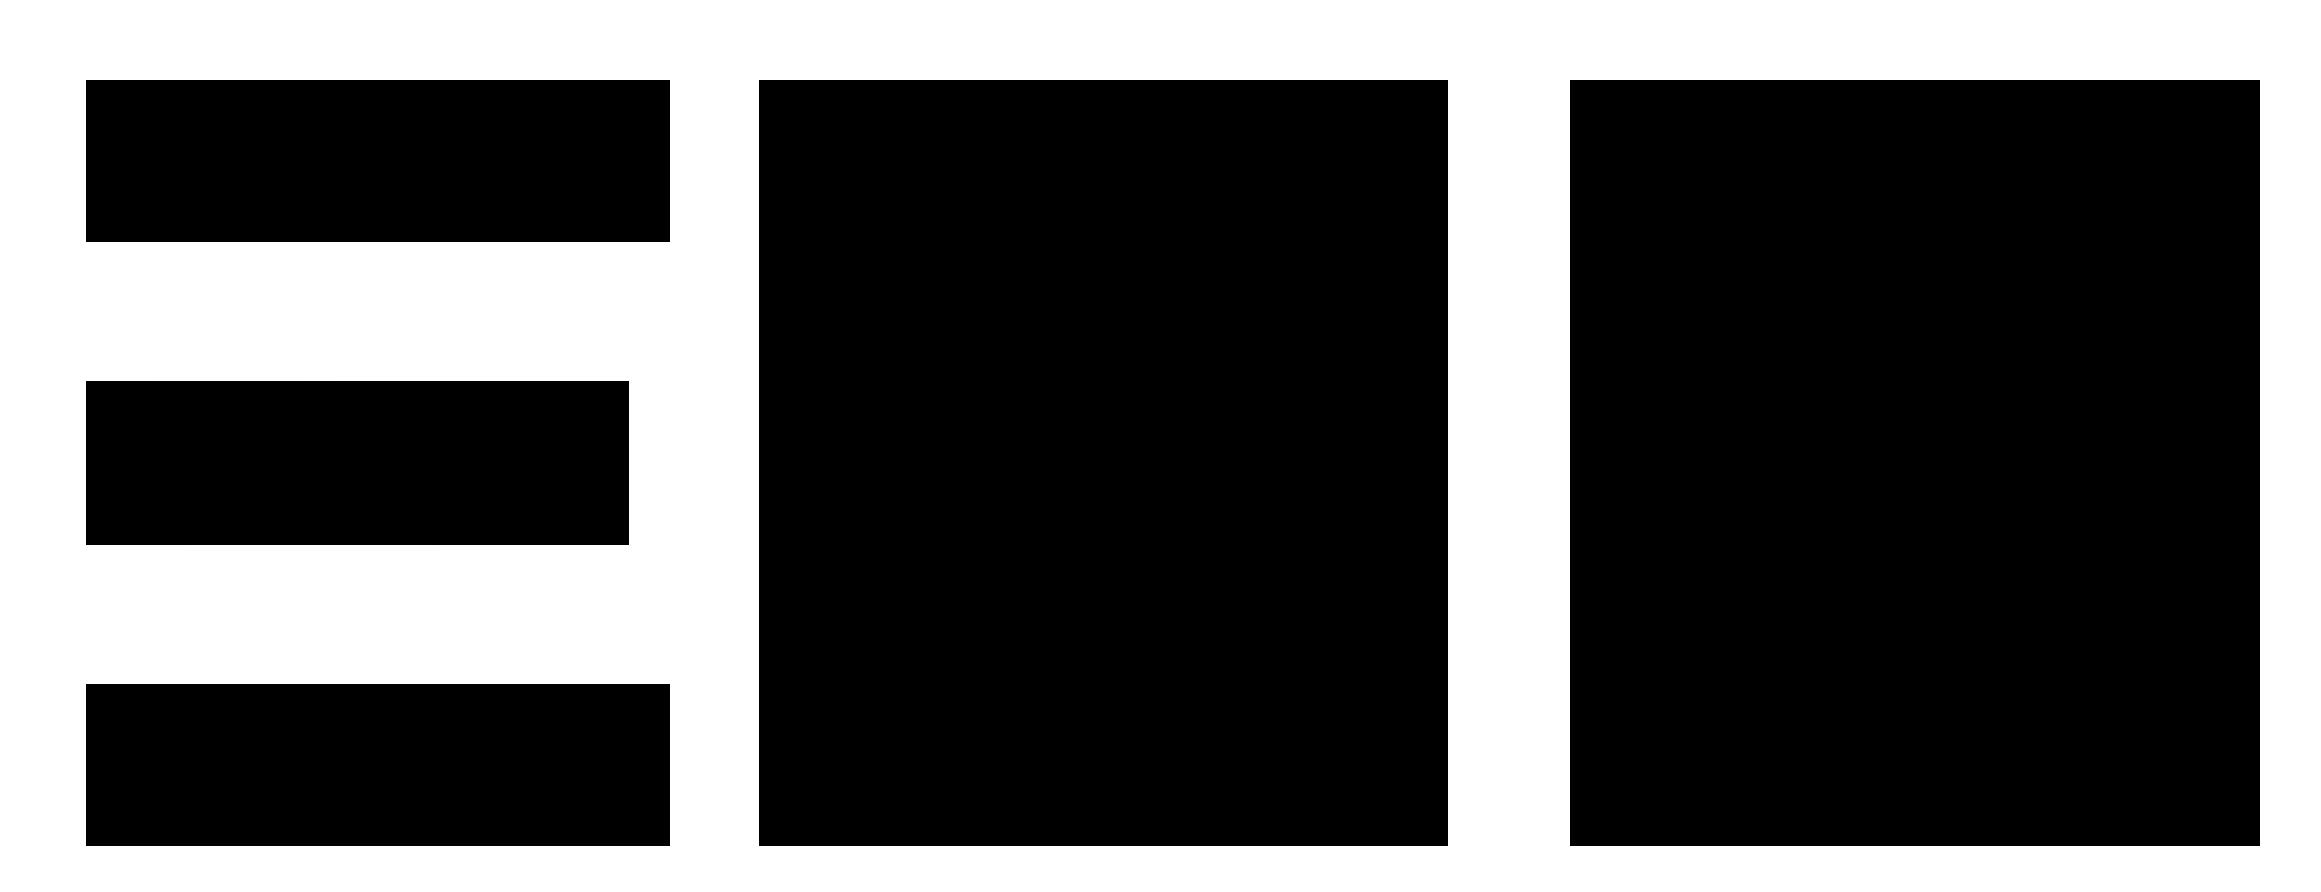 https://2018.extremaduradigitalday.com/wp-content/uploads/2018/07/logo-edd-negro-horizontal.png